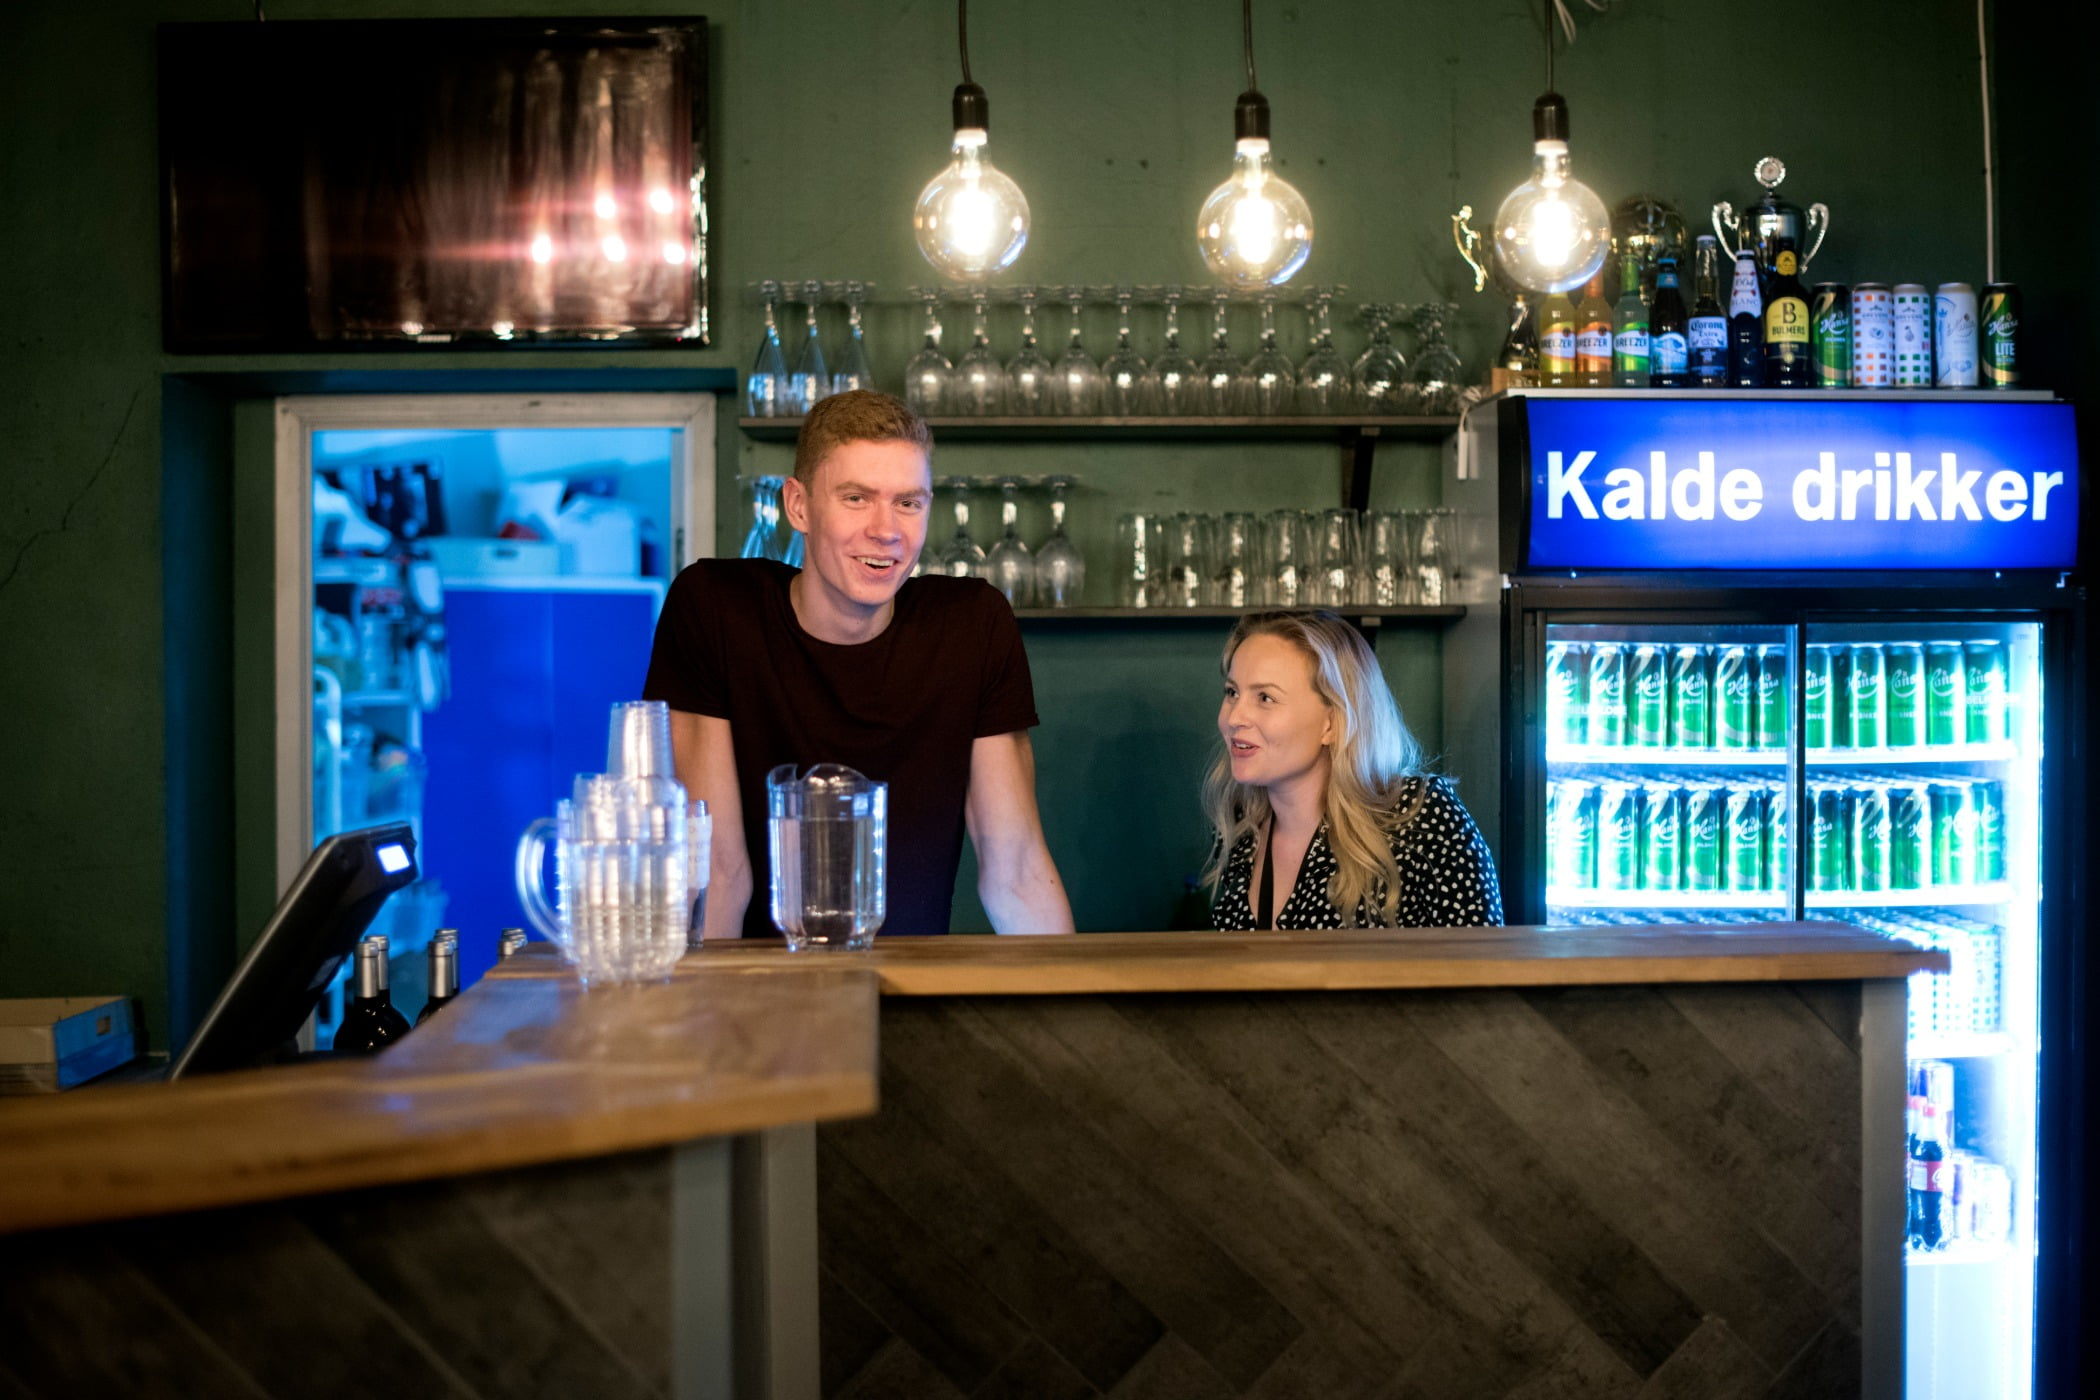 Alcoholic beverage, Drinking establishment, Light fixture, Tavern, Drinkware, Bottle, Table, Drink, Barware, Lighting